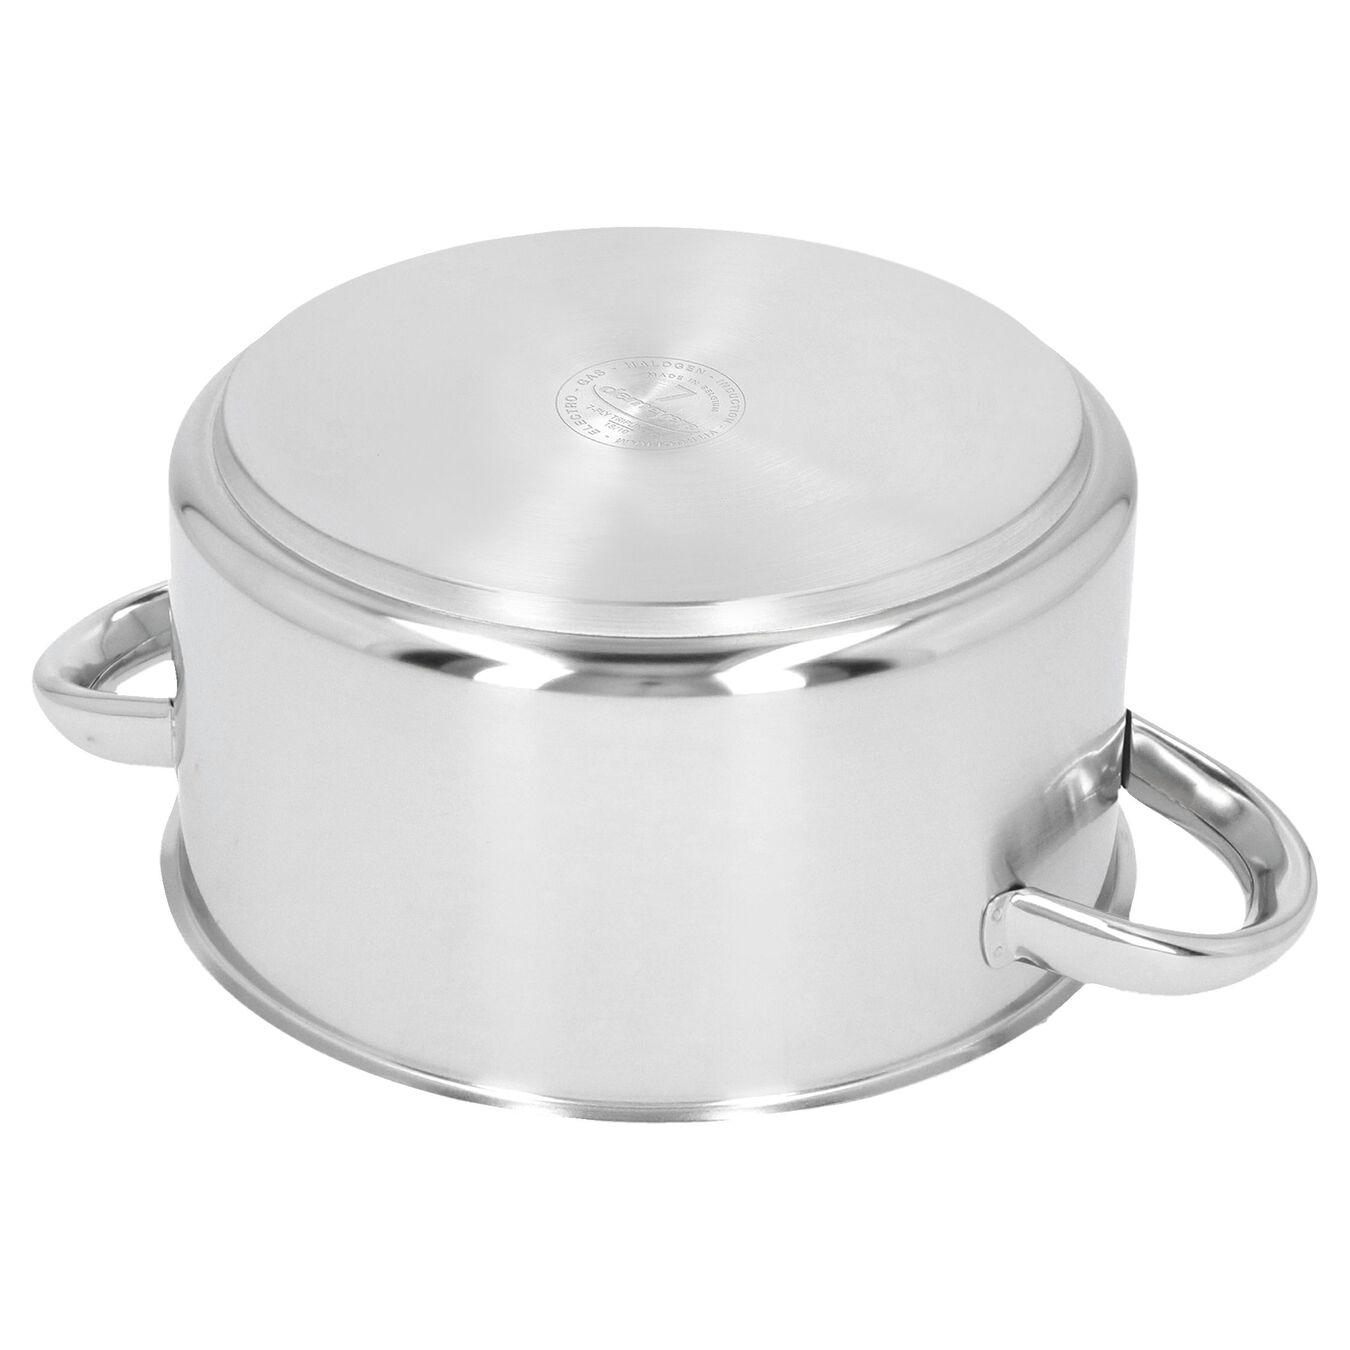 Kookpot met deksel 18 cm / 2,2 l,,large 5